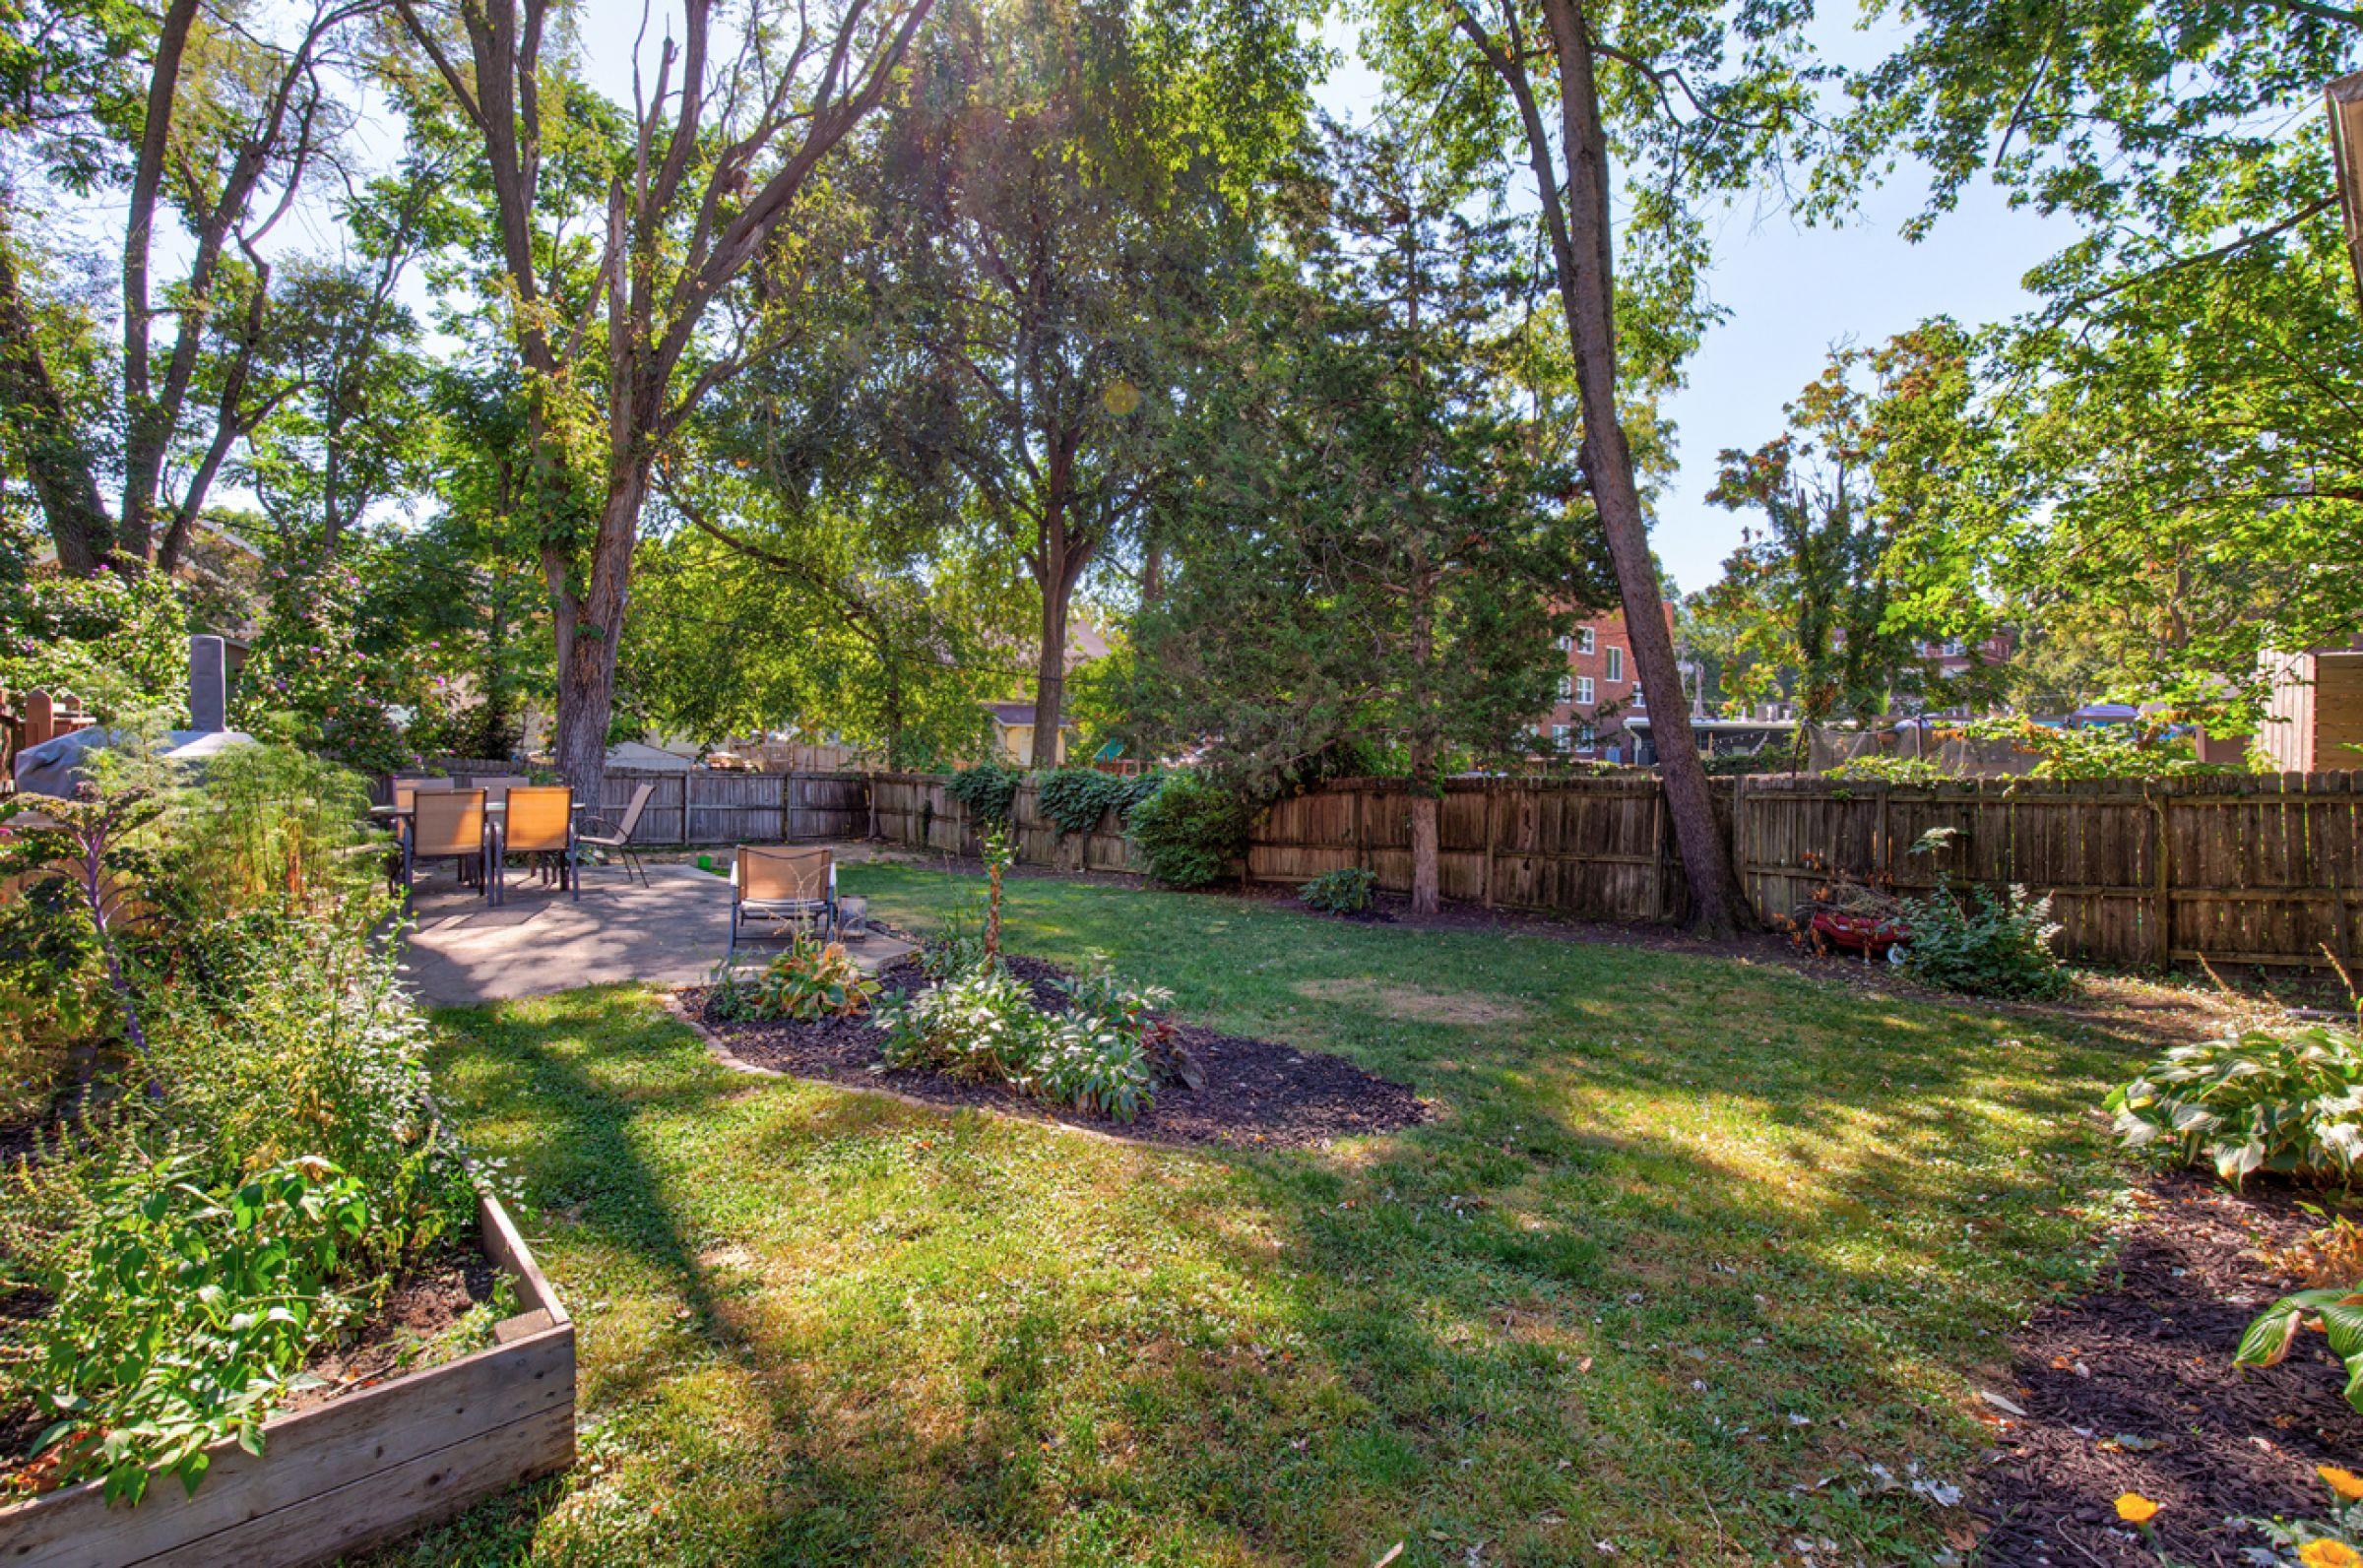 residential-polk-county-iowa-0-acres-listing-number-15153-2-2020-09-02-232350.jpg